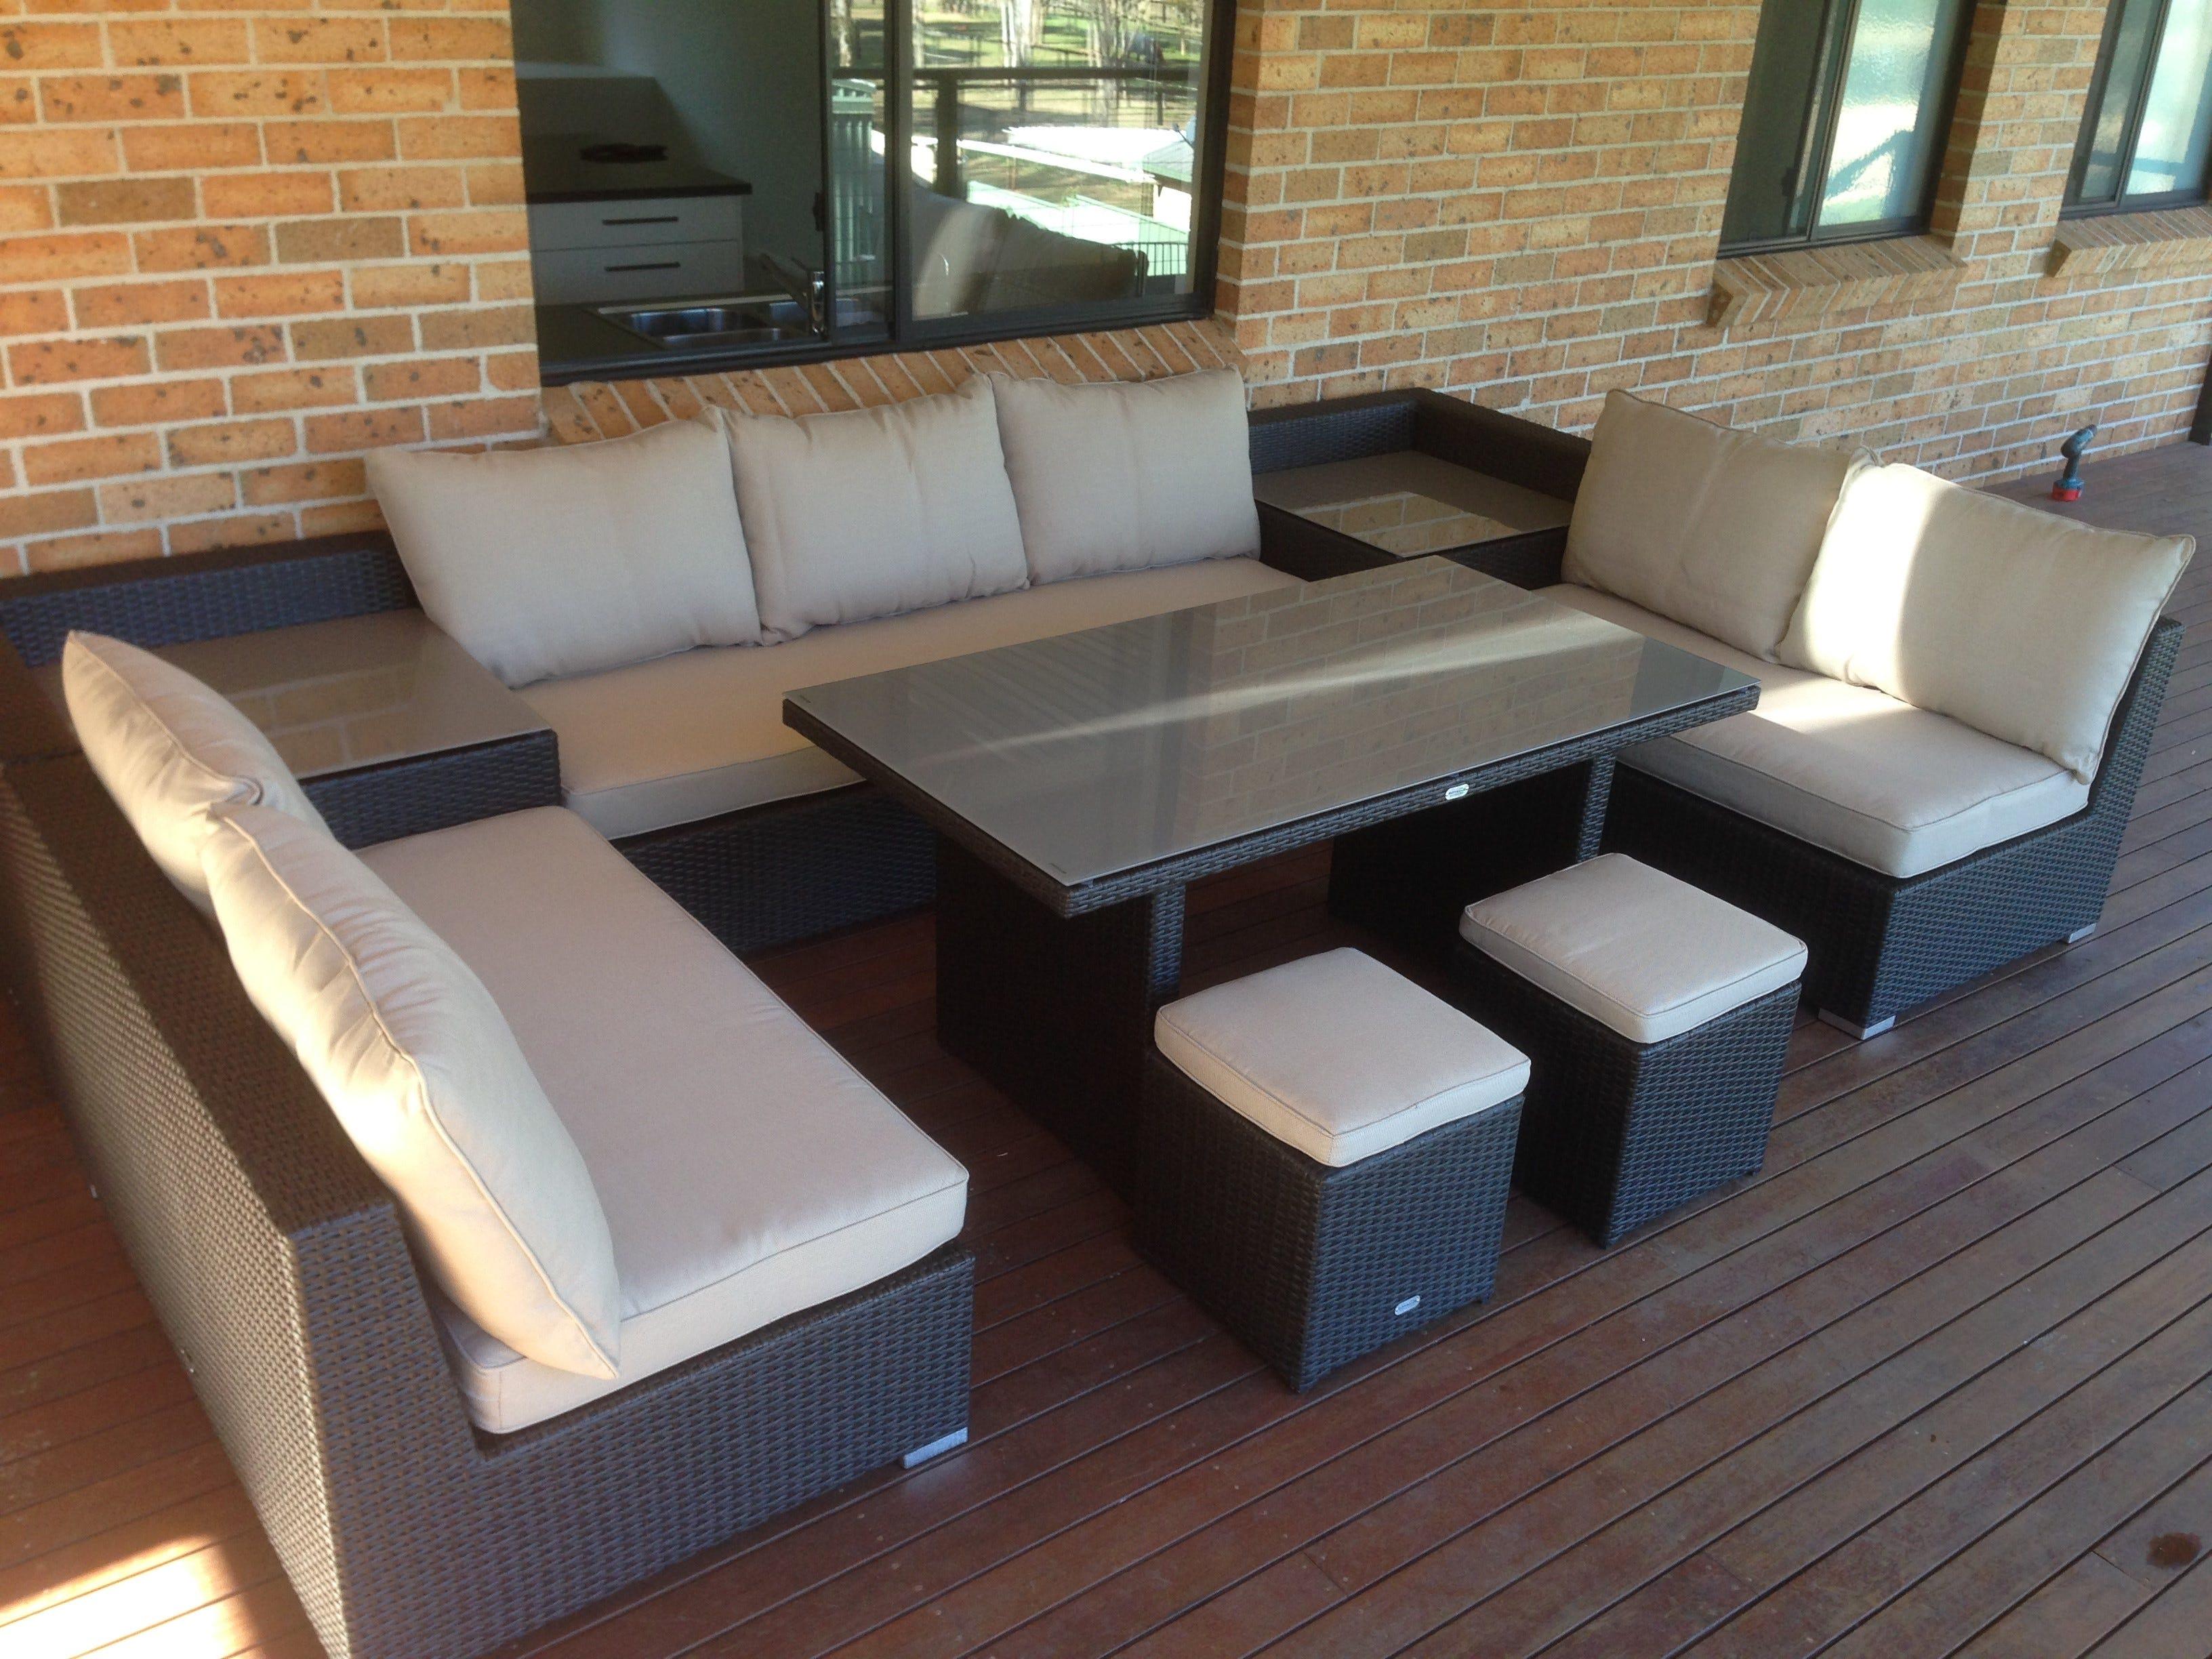 furniture outdoor cupboard australia whats a new satara chair luxury lounge vega